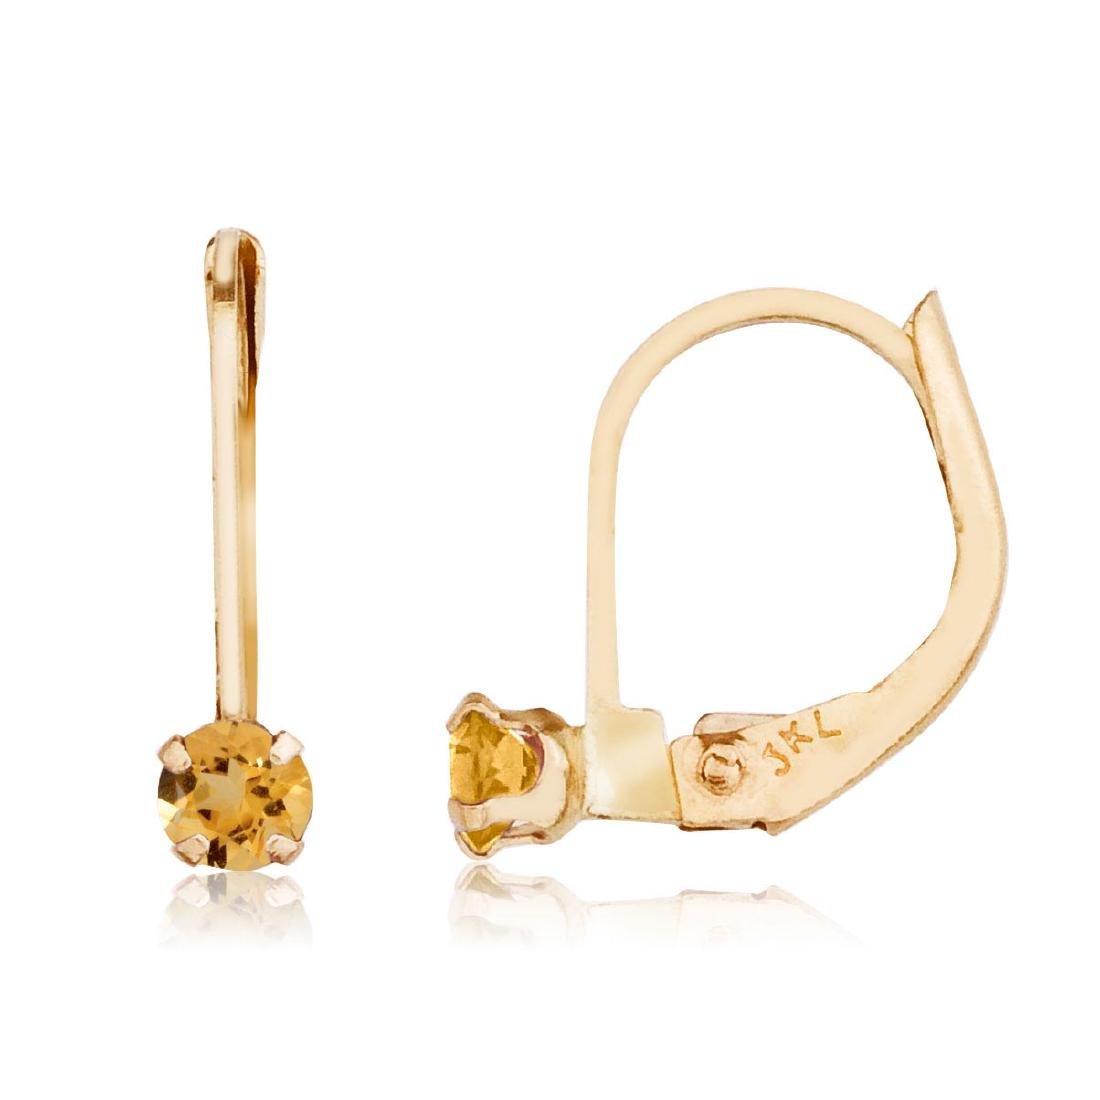 Certified 14k Petite Citrine Leverback Earrings